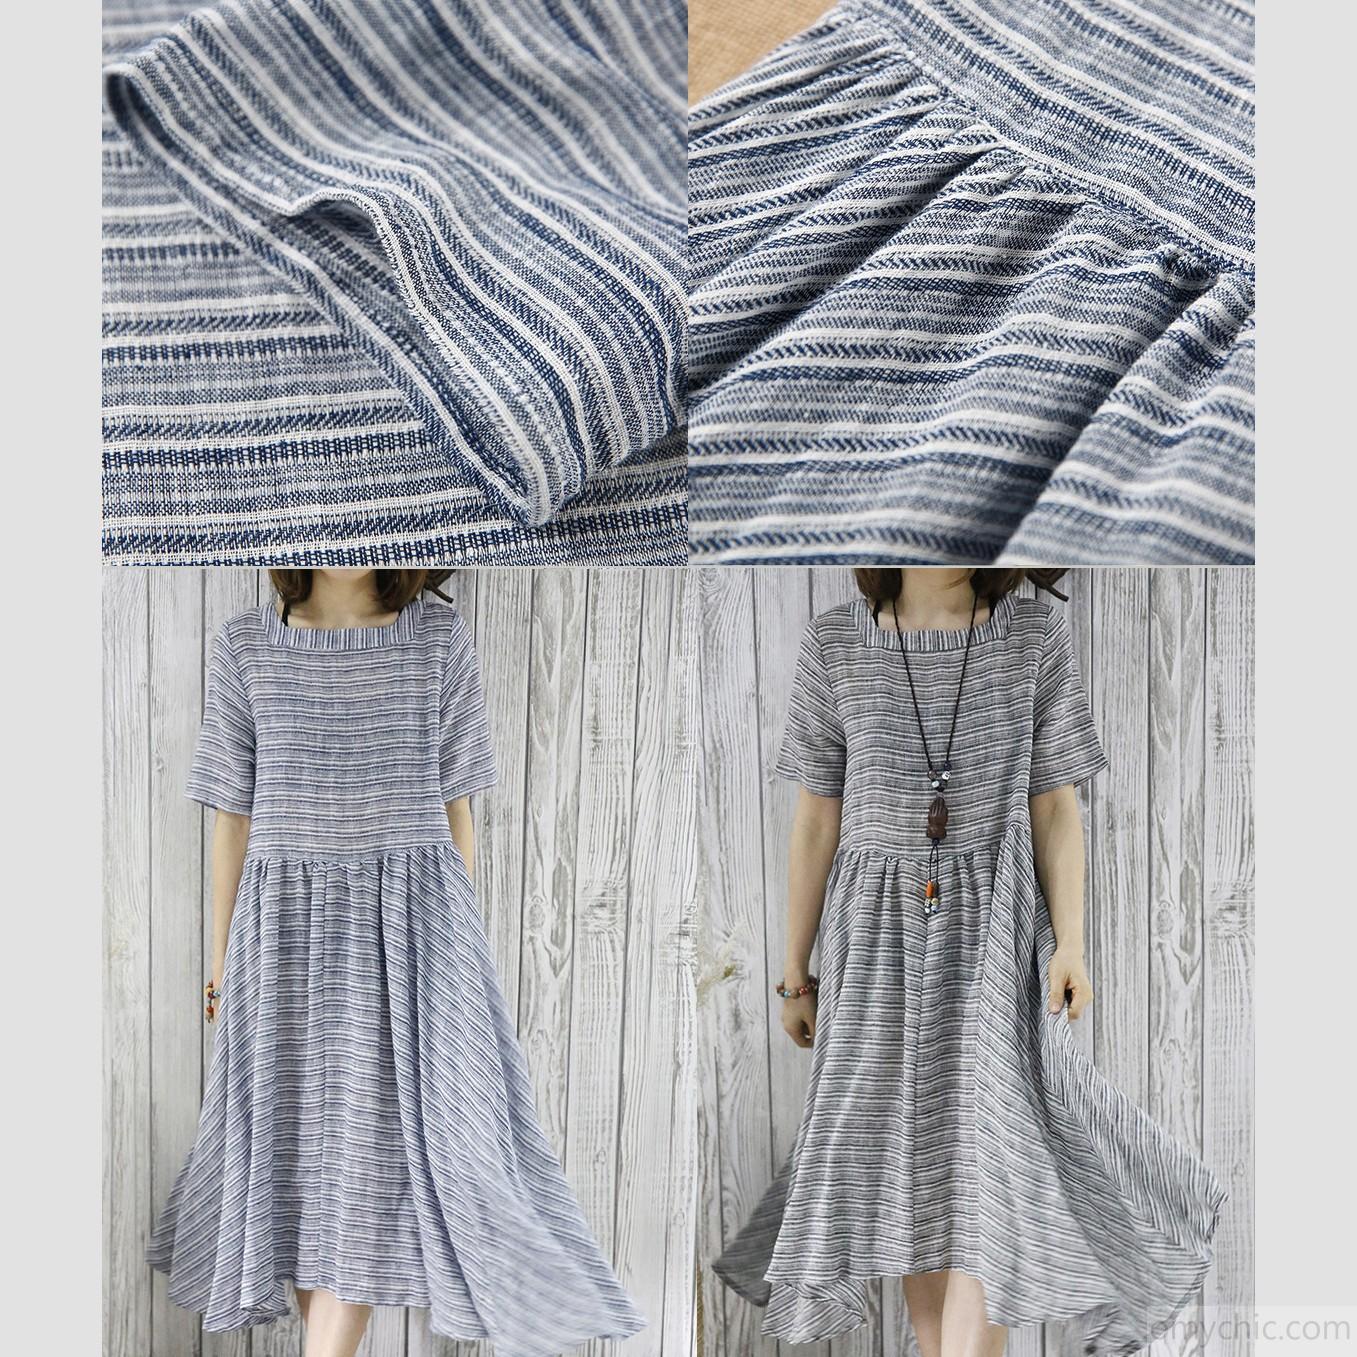 Stylish Maternity Clothes | Maternity Wedding Dresses | Maternity Sundress